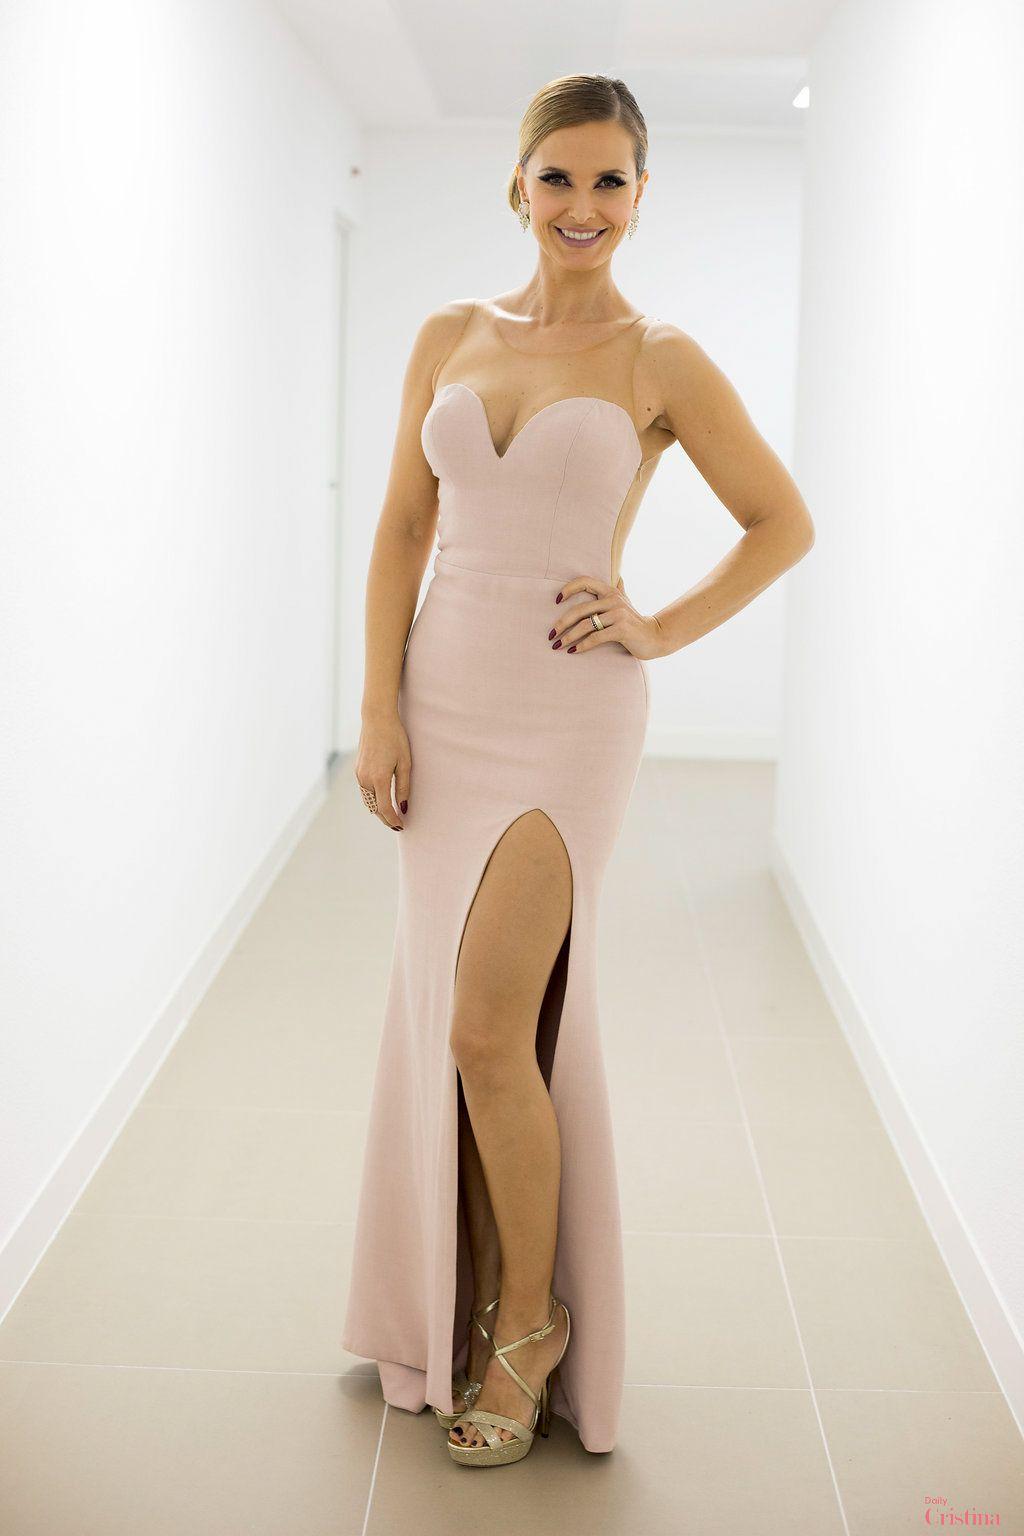 Paraíso Feminino dá dicas de vestidos de formatura ideais